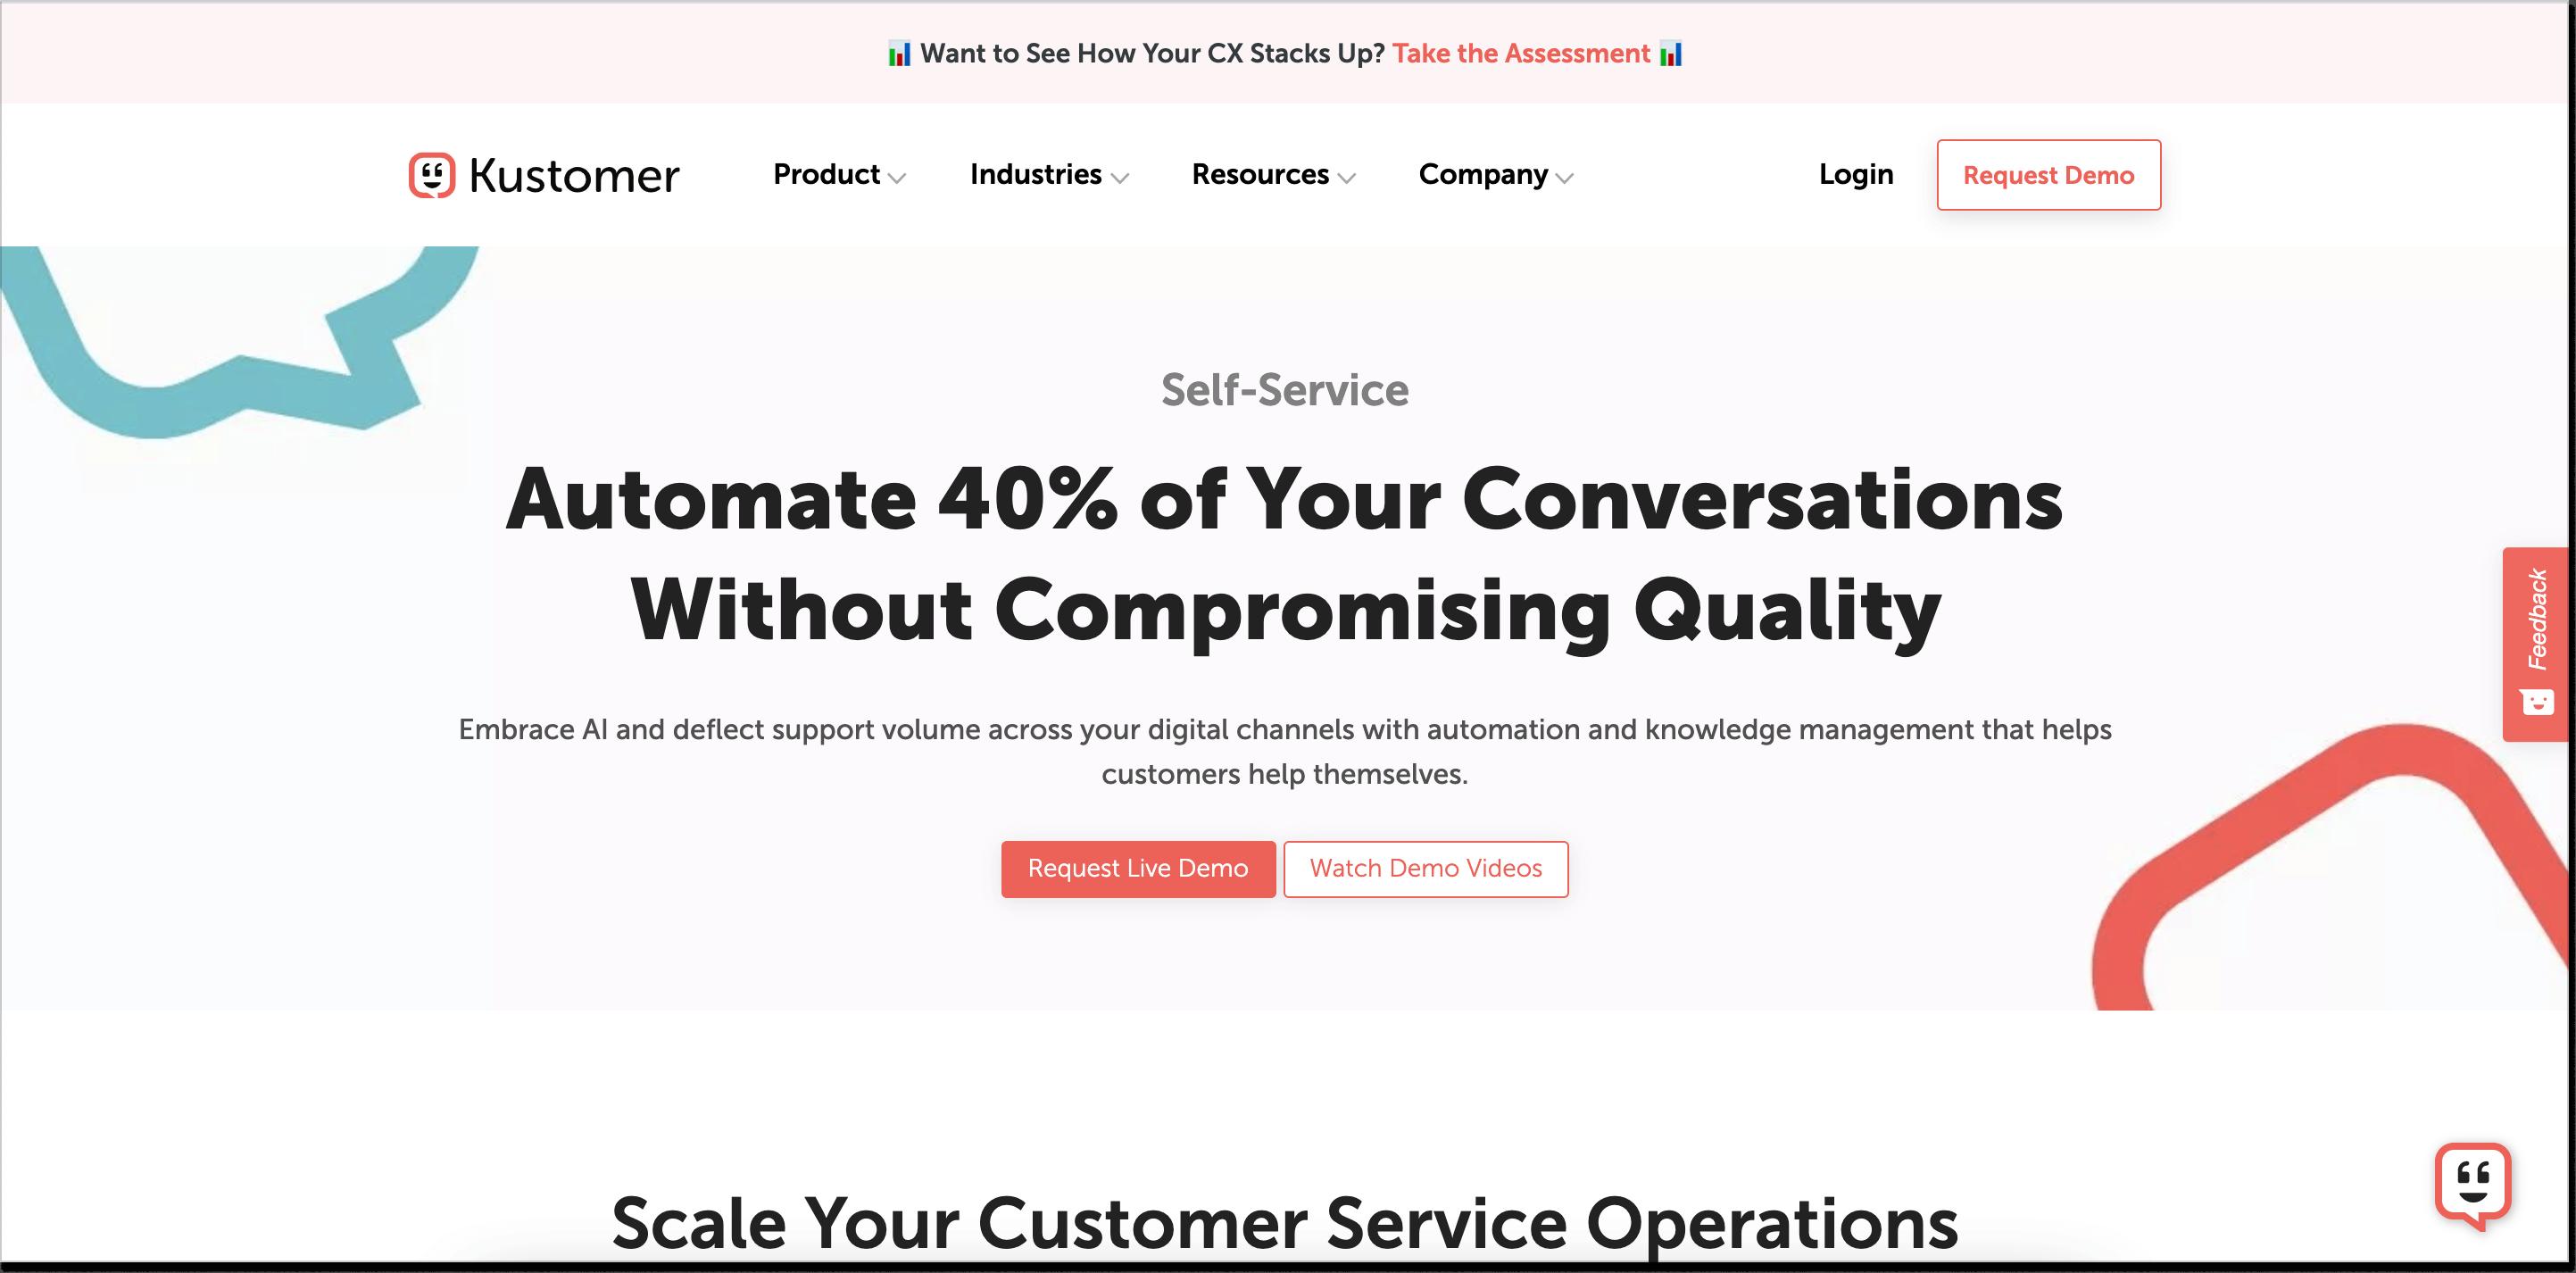 Kustomer self-service homepage